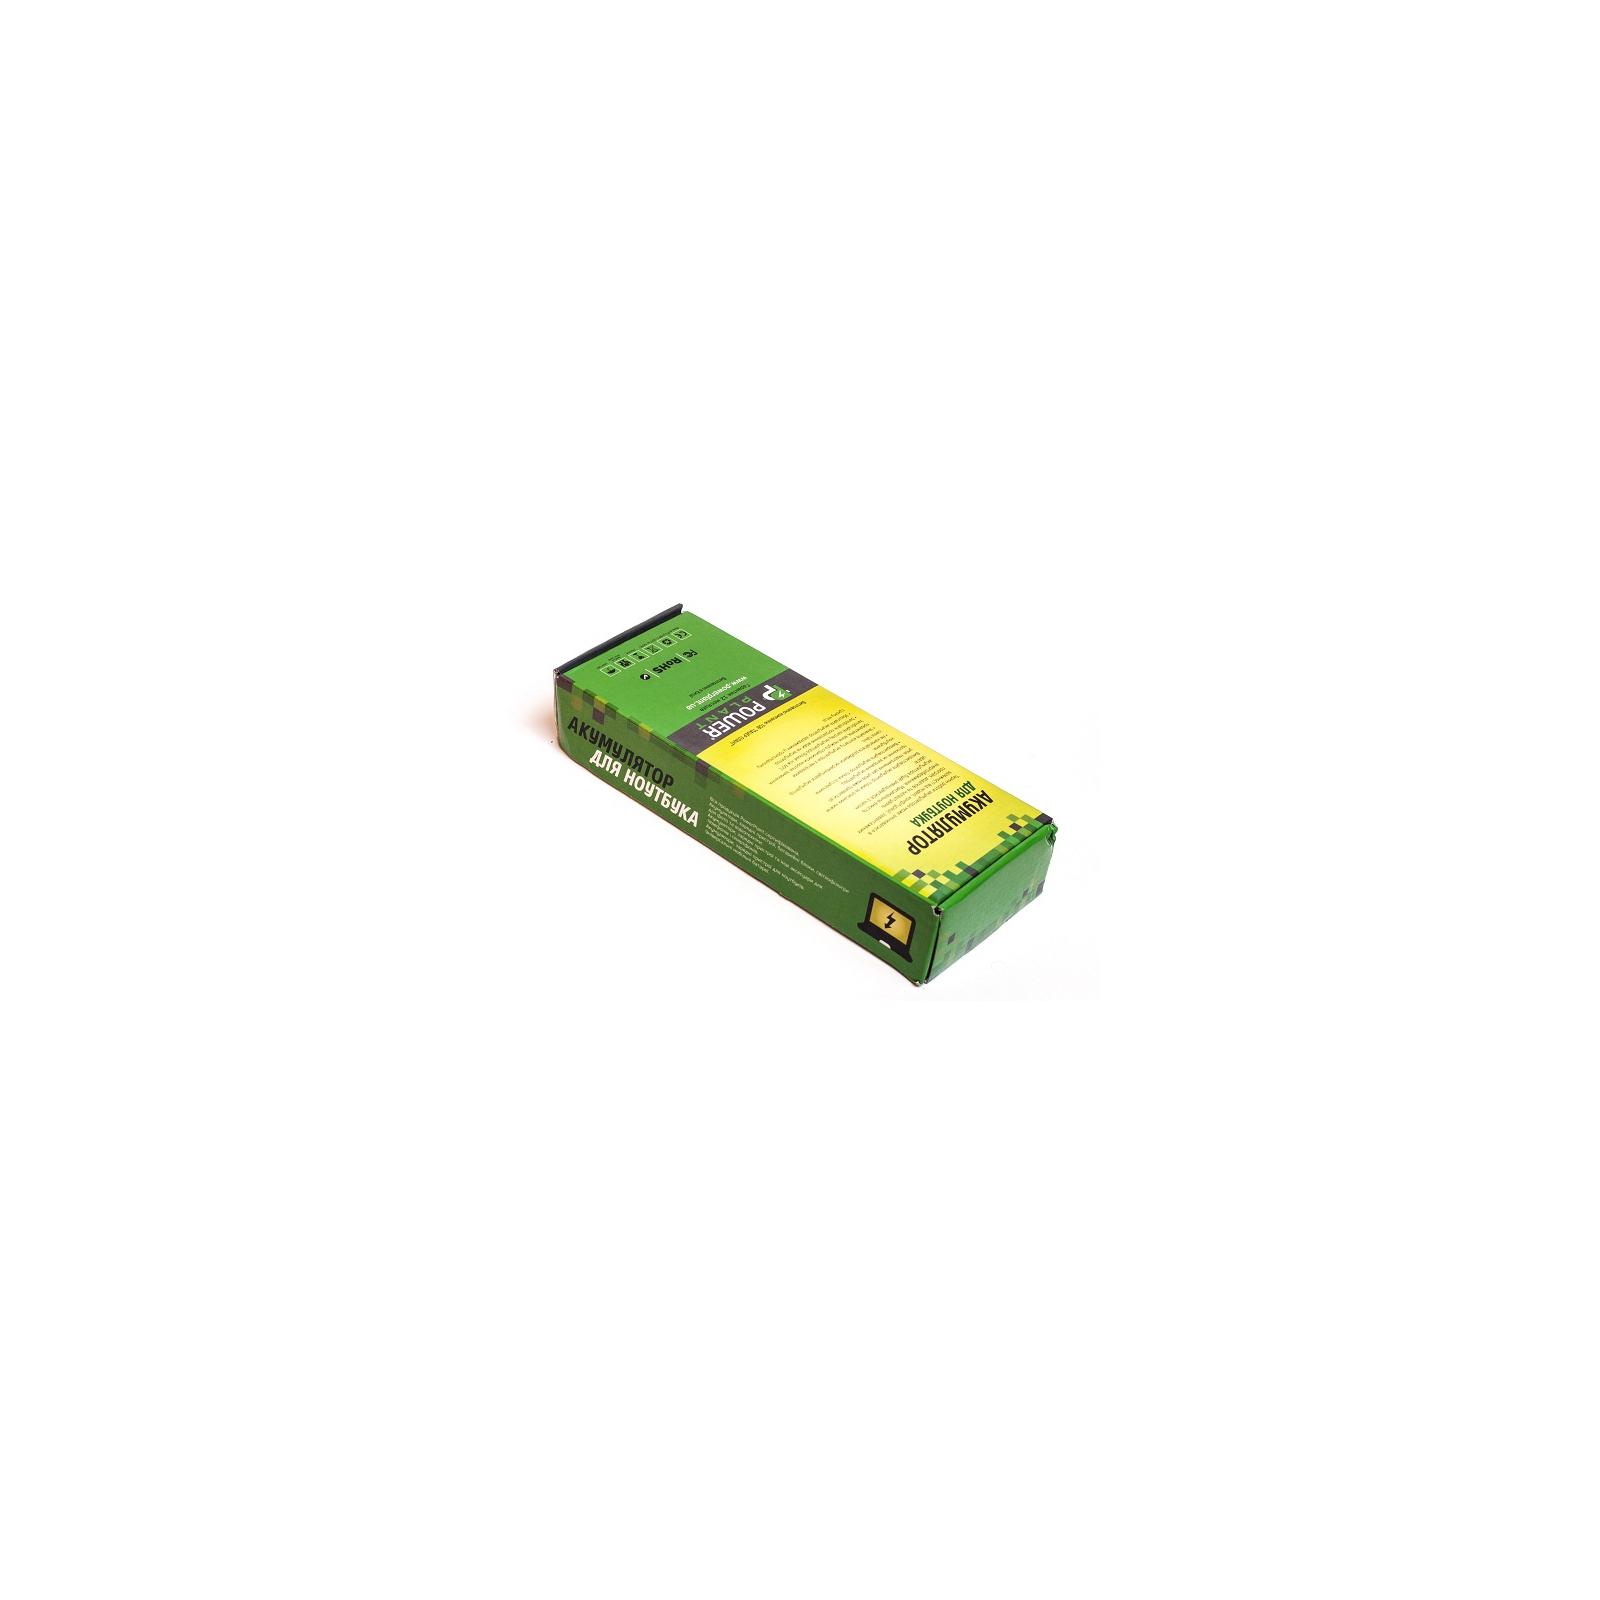 Аккумулятор для ноутбука DELL Vostro 1310 (N956C, DL1310LH) 11.1V 5200mAh PowerPlant (NB00000073) изображение 2